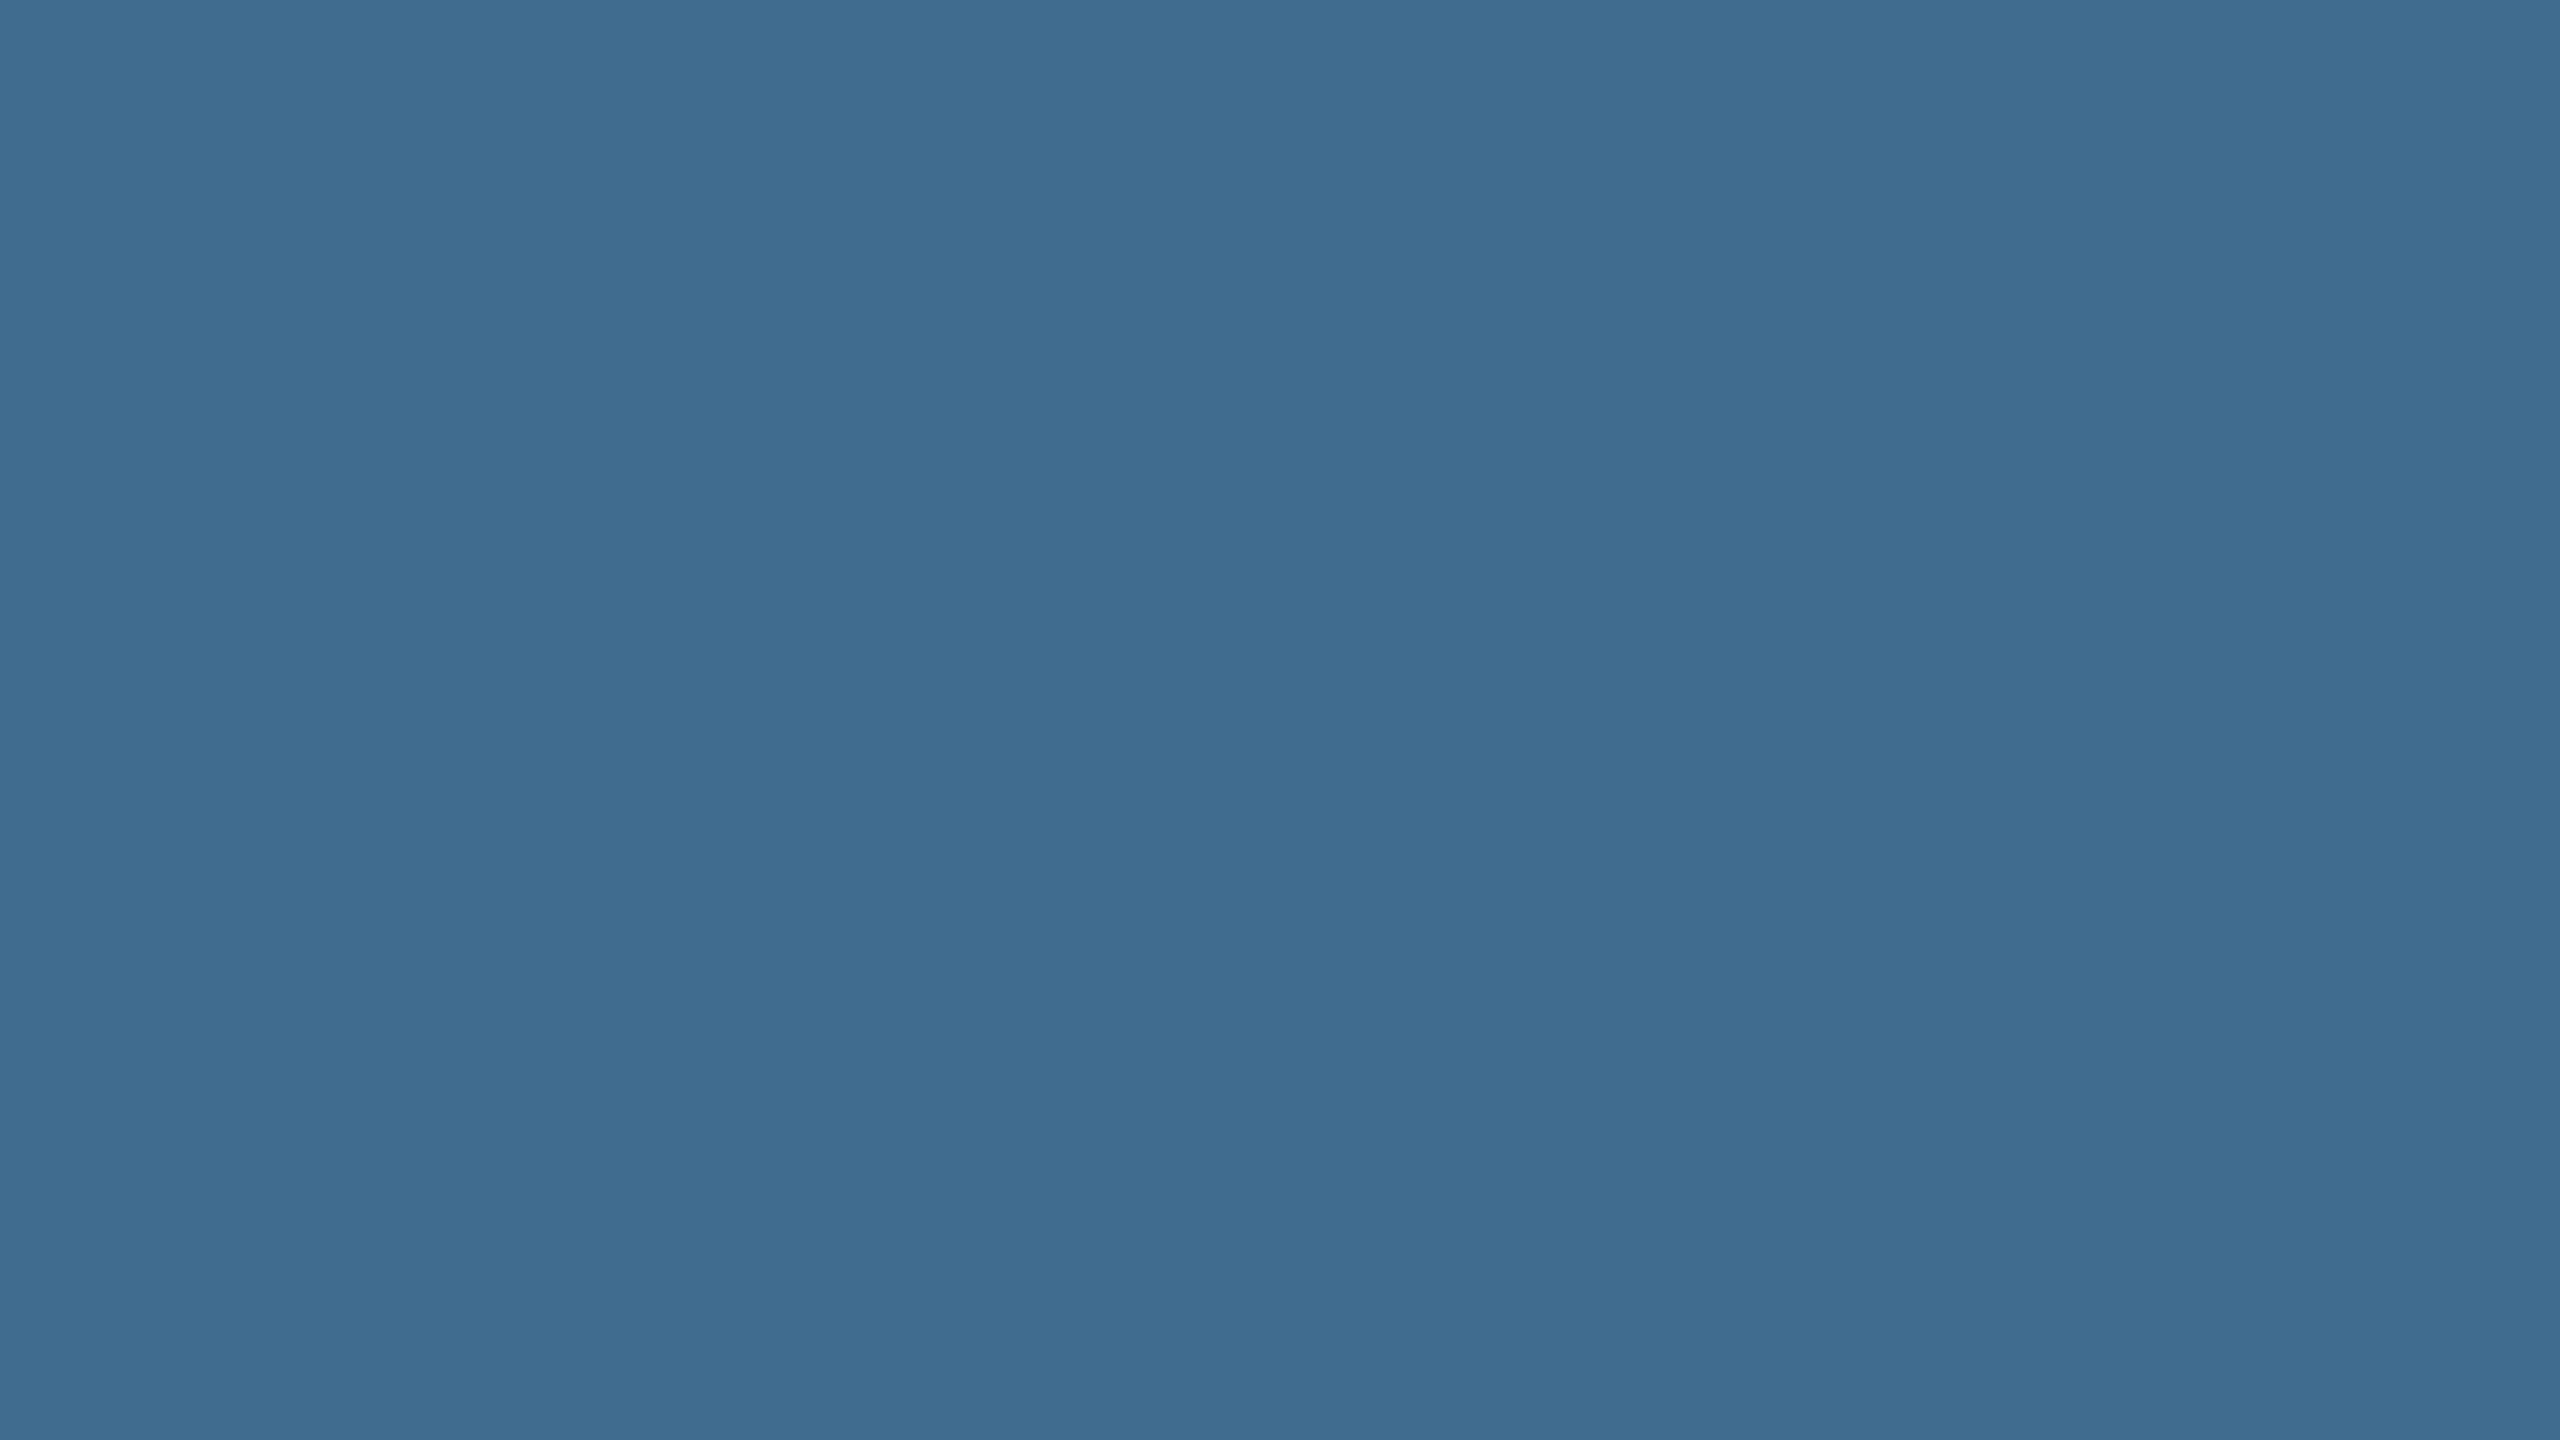 navy blue background hd